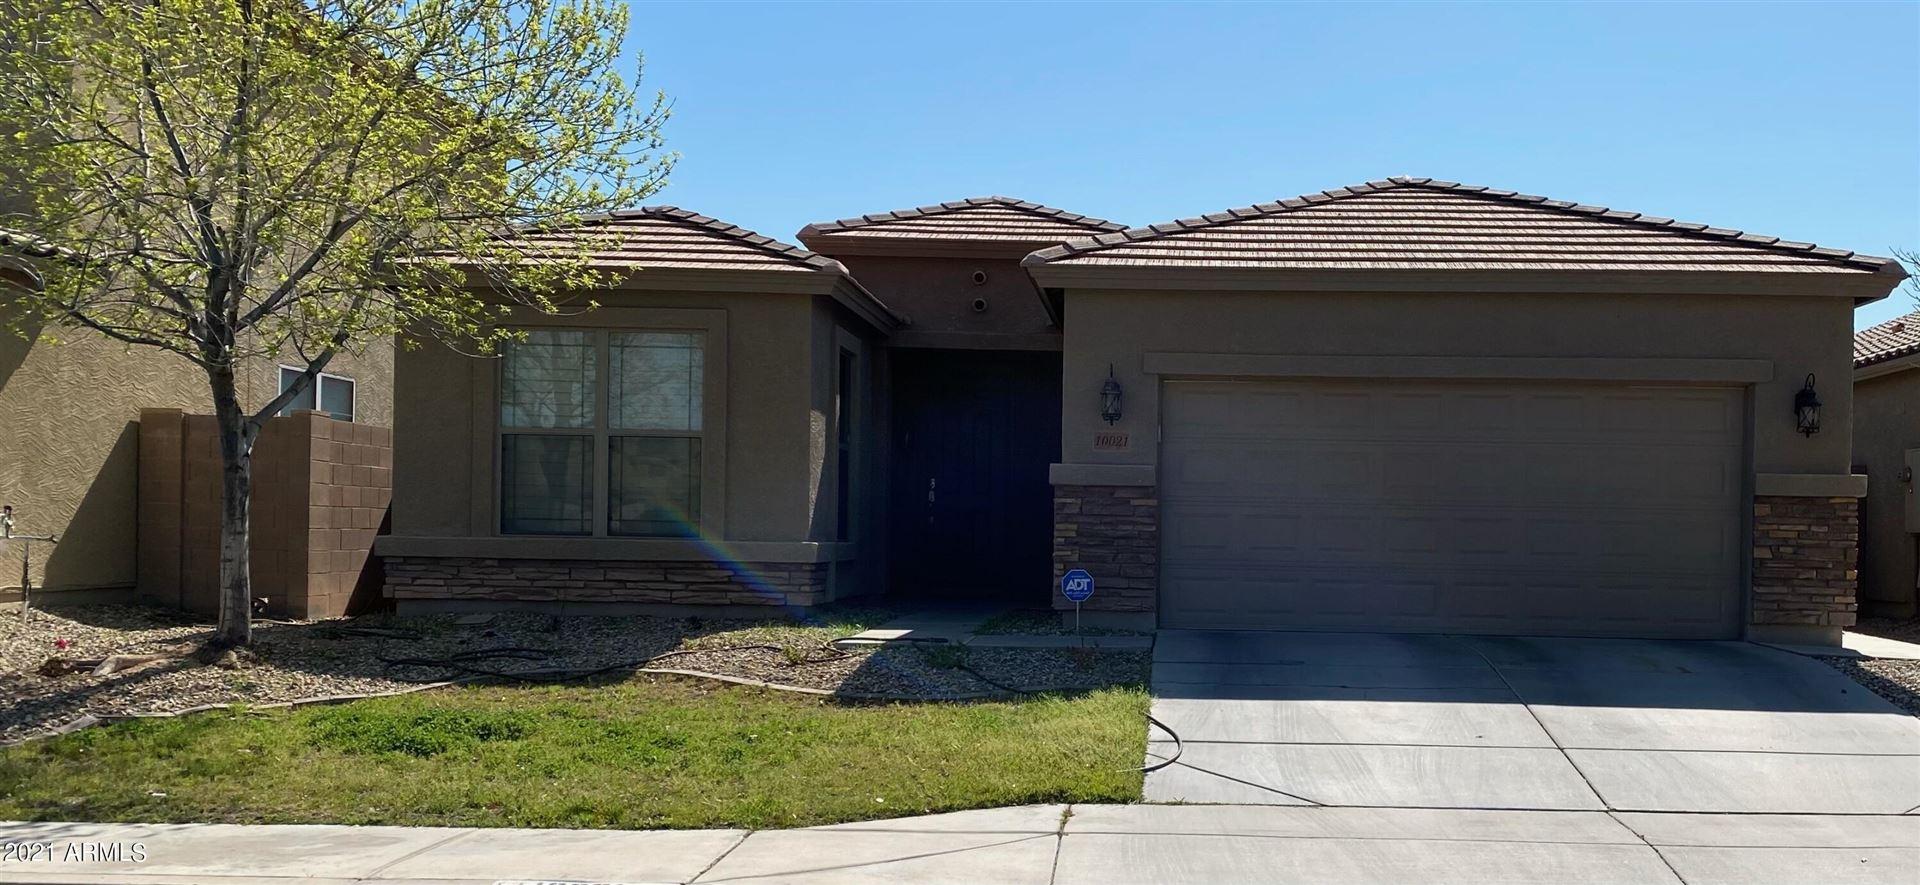 Photo of 10021 W ALBENIZ Place, Tolleson, AZ 85353 (MLS # 6200406)